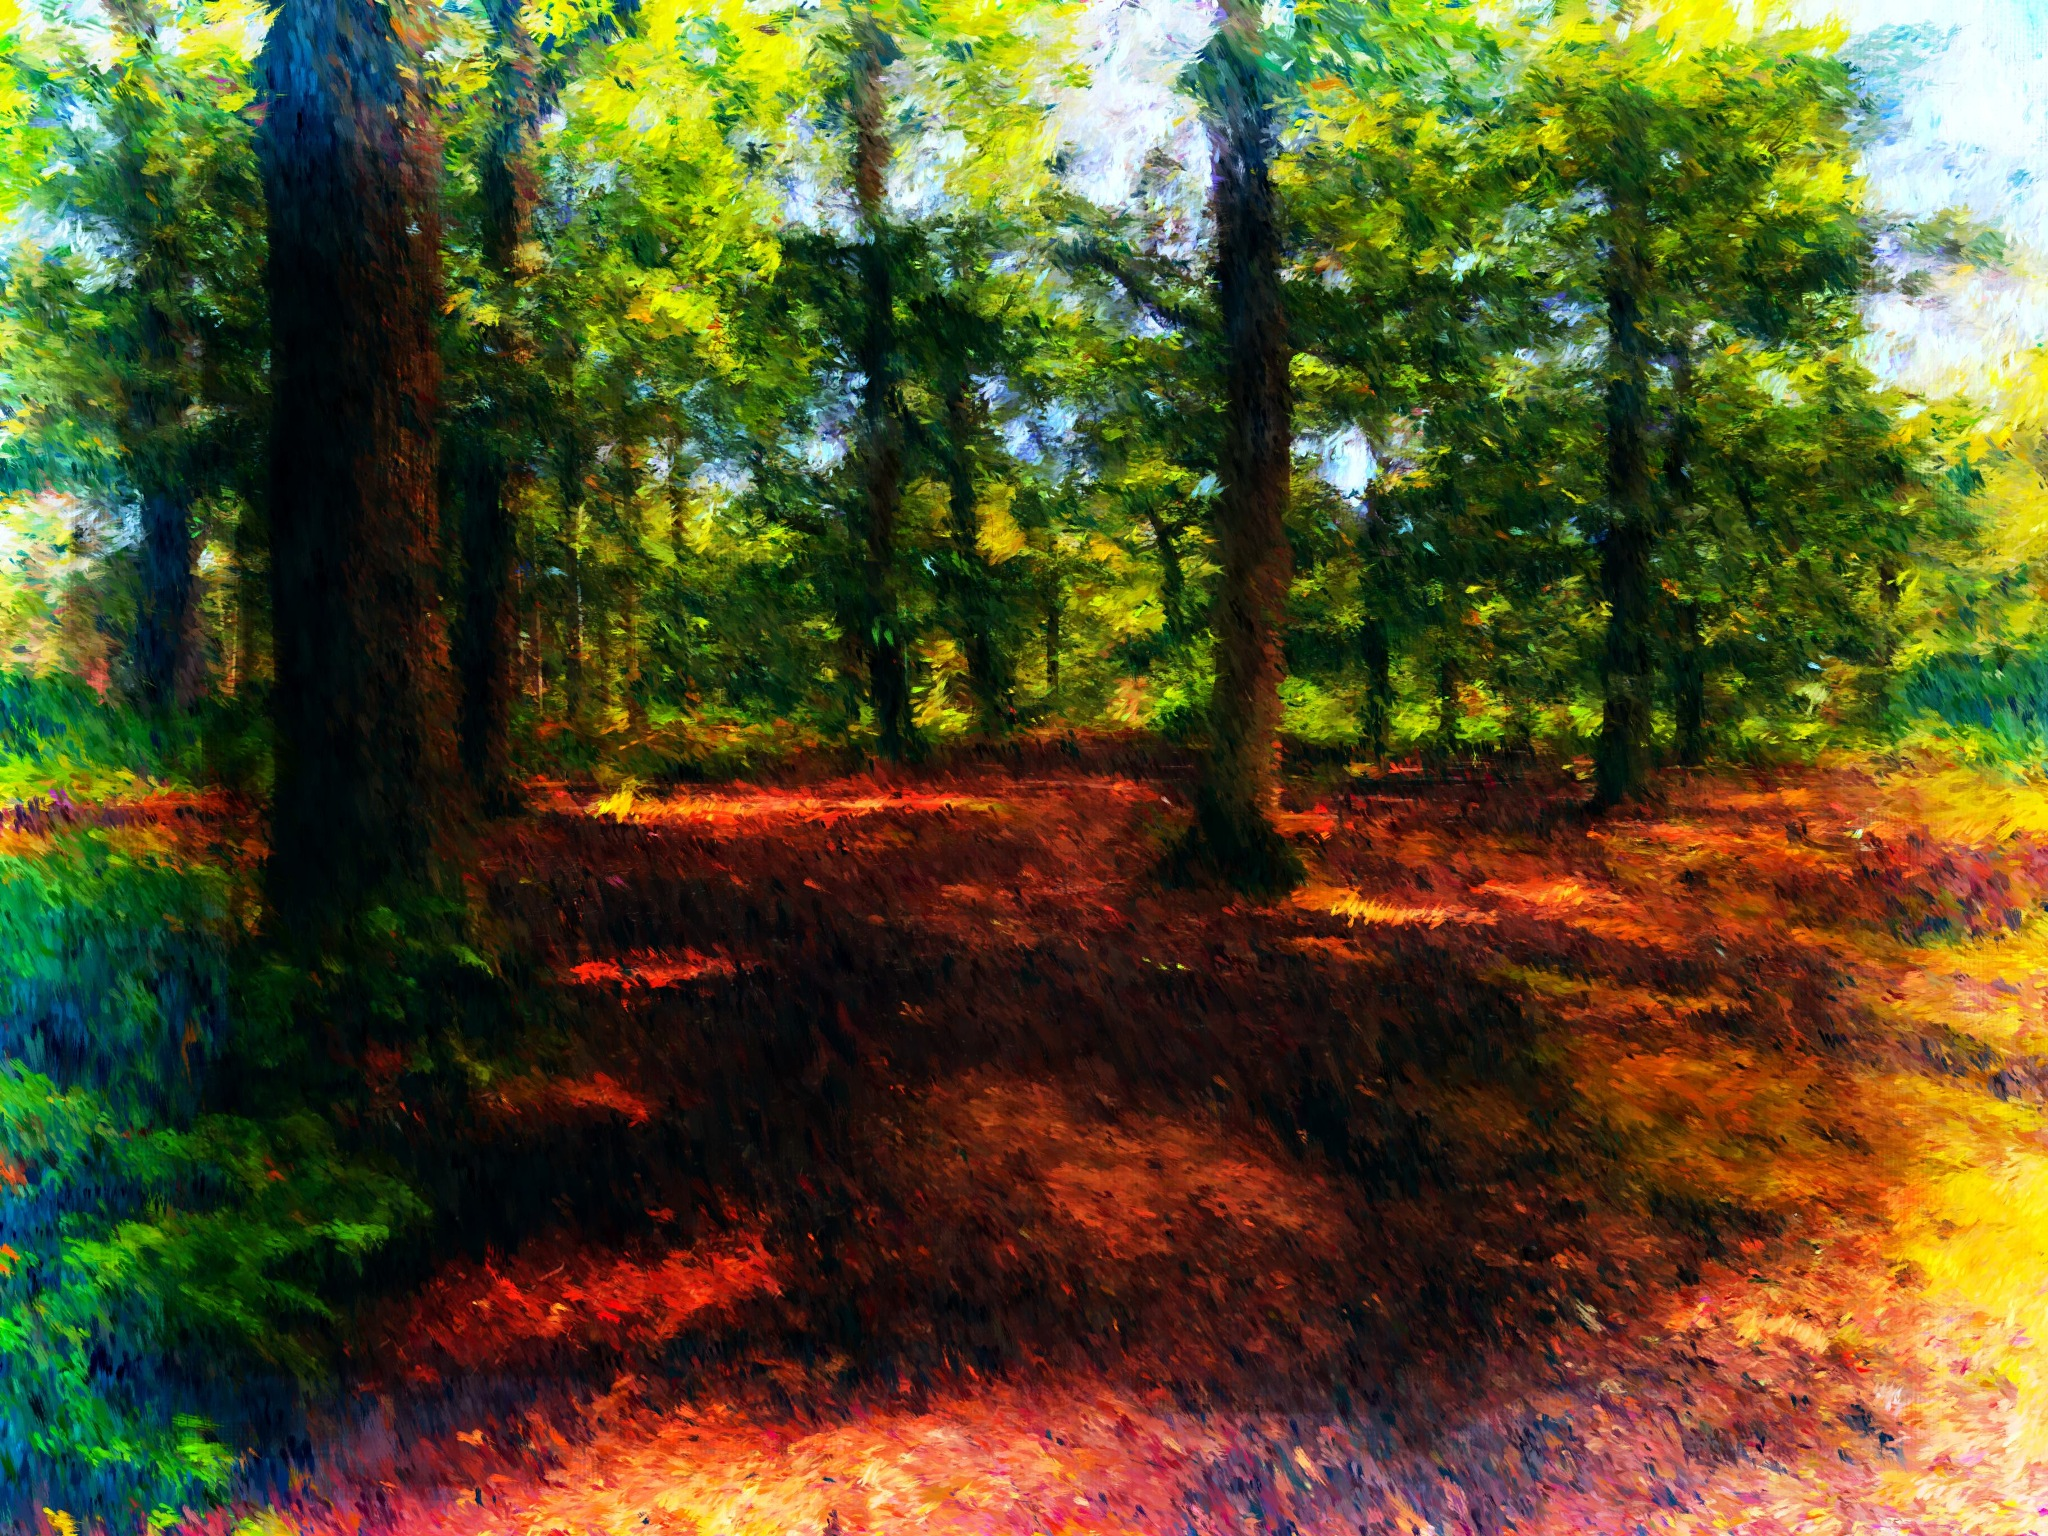 woodland by paulrobin.andrews